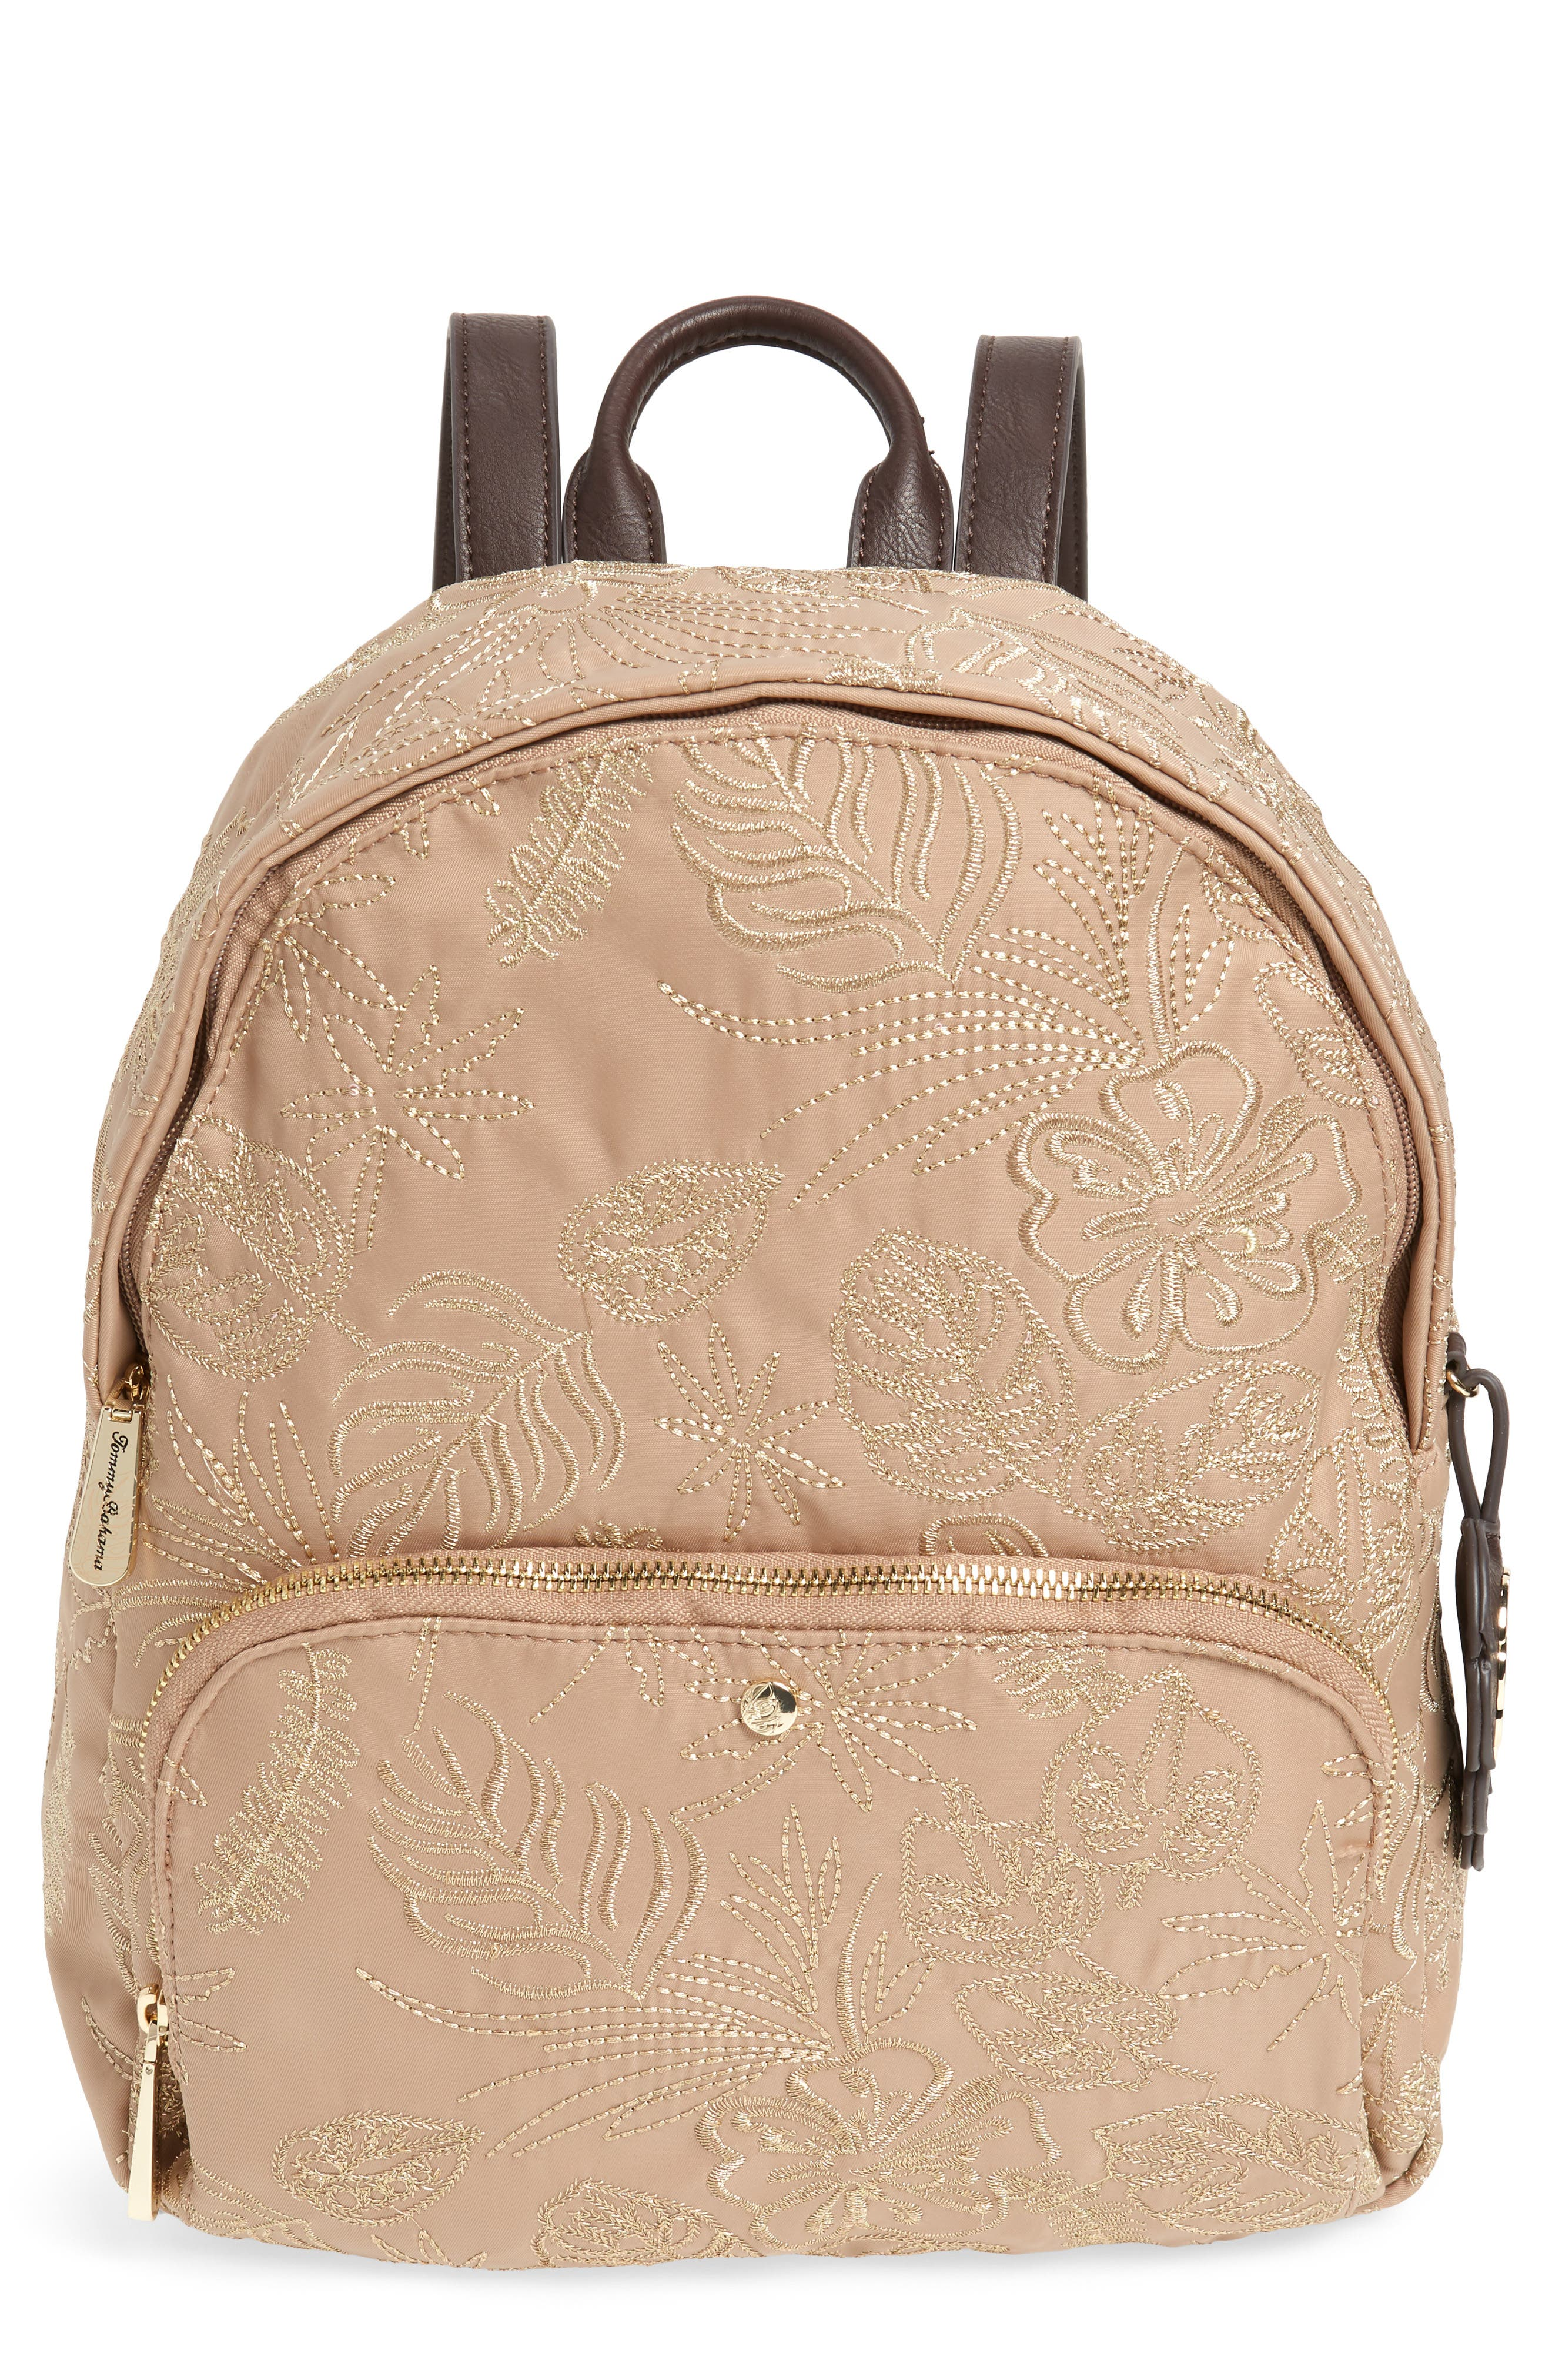 Siesta Key Backpack,                             Main thumbnail 1, color,                             230